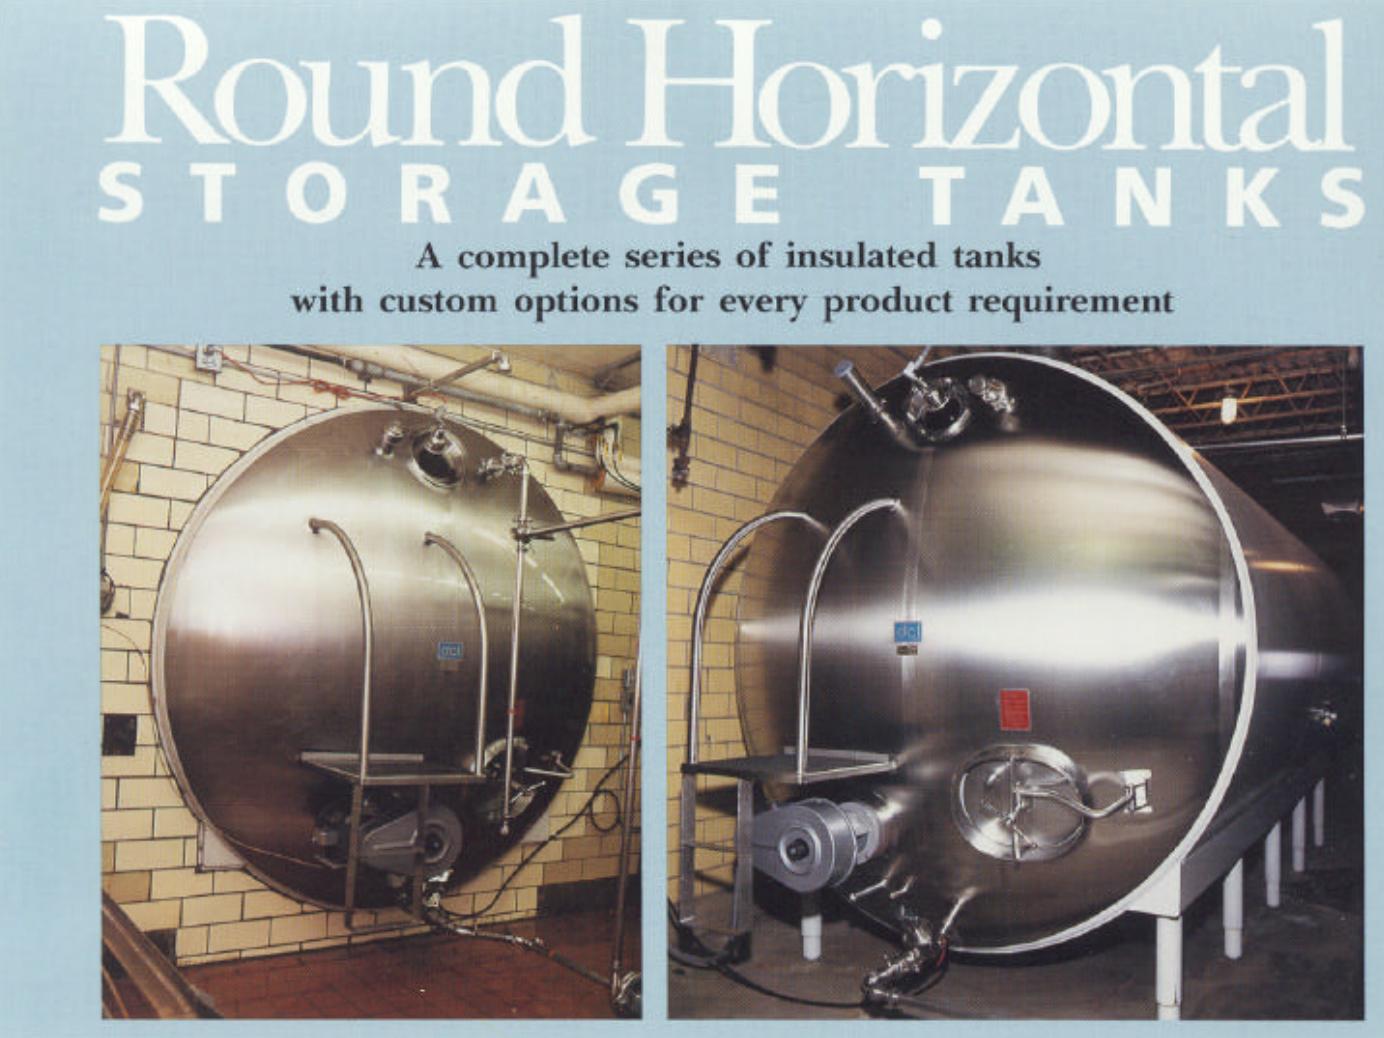 Round Horizontal Storage Tanks